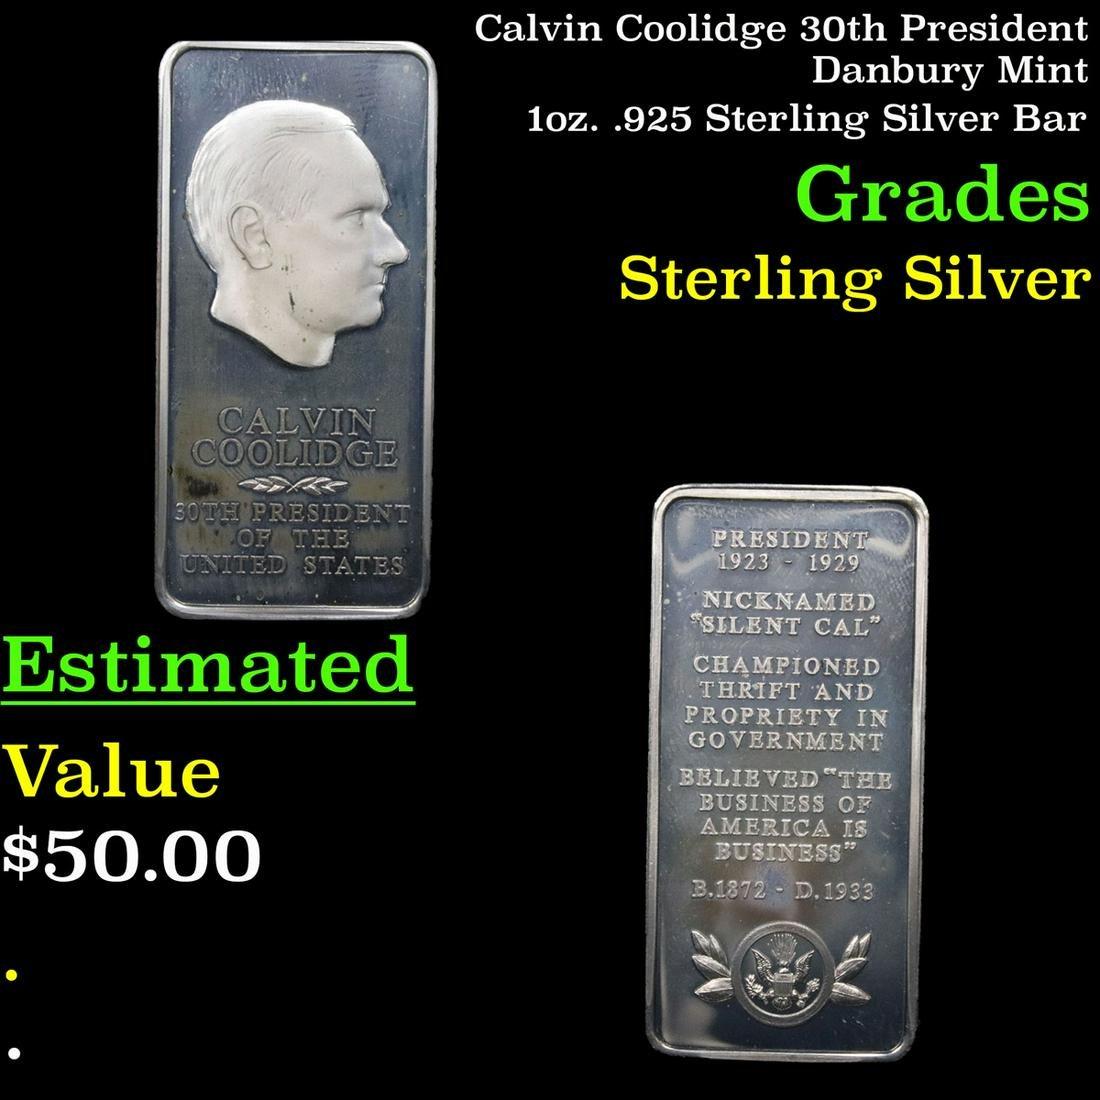 Calvin Coolidge 30h President Danbury Mint 1oz. .925